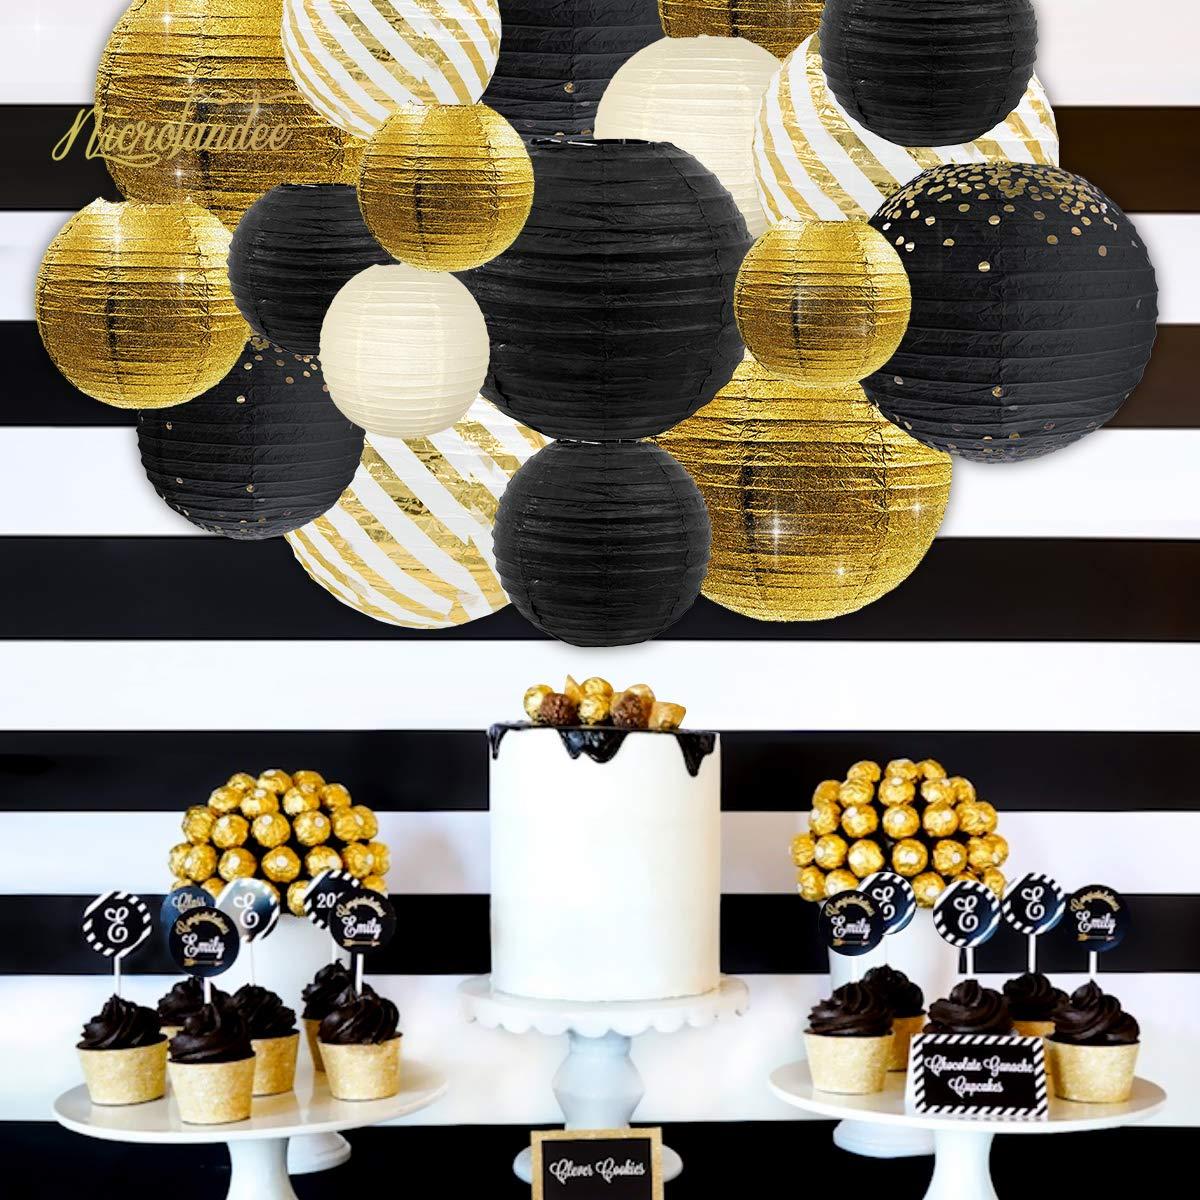 NICROLANDEE Black Gold Metallic Glitter Paper Lantern Decorations with Gold Foil Metallic Fringe Curtains for Graduation Wedding Bridal Shower Hen Bachelorette Birthday Anniversary Backdrop Decor by NICROLANDEE (Image #3)